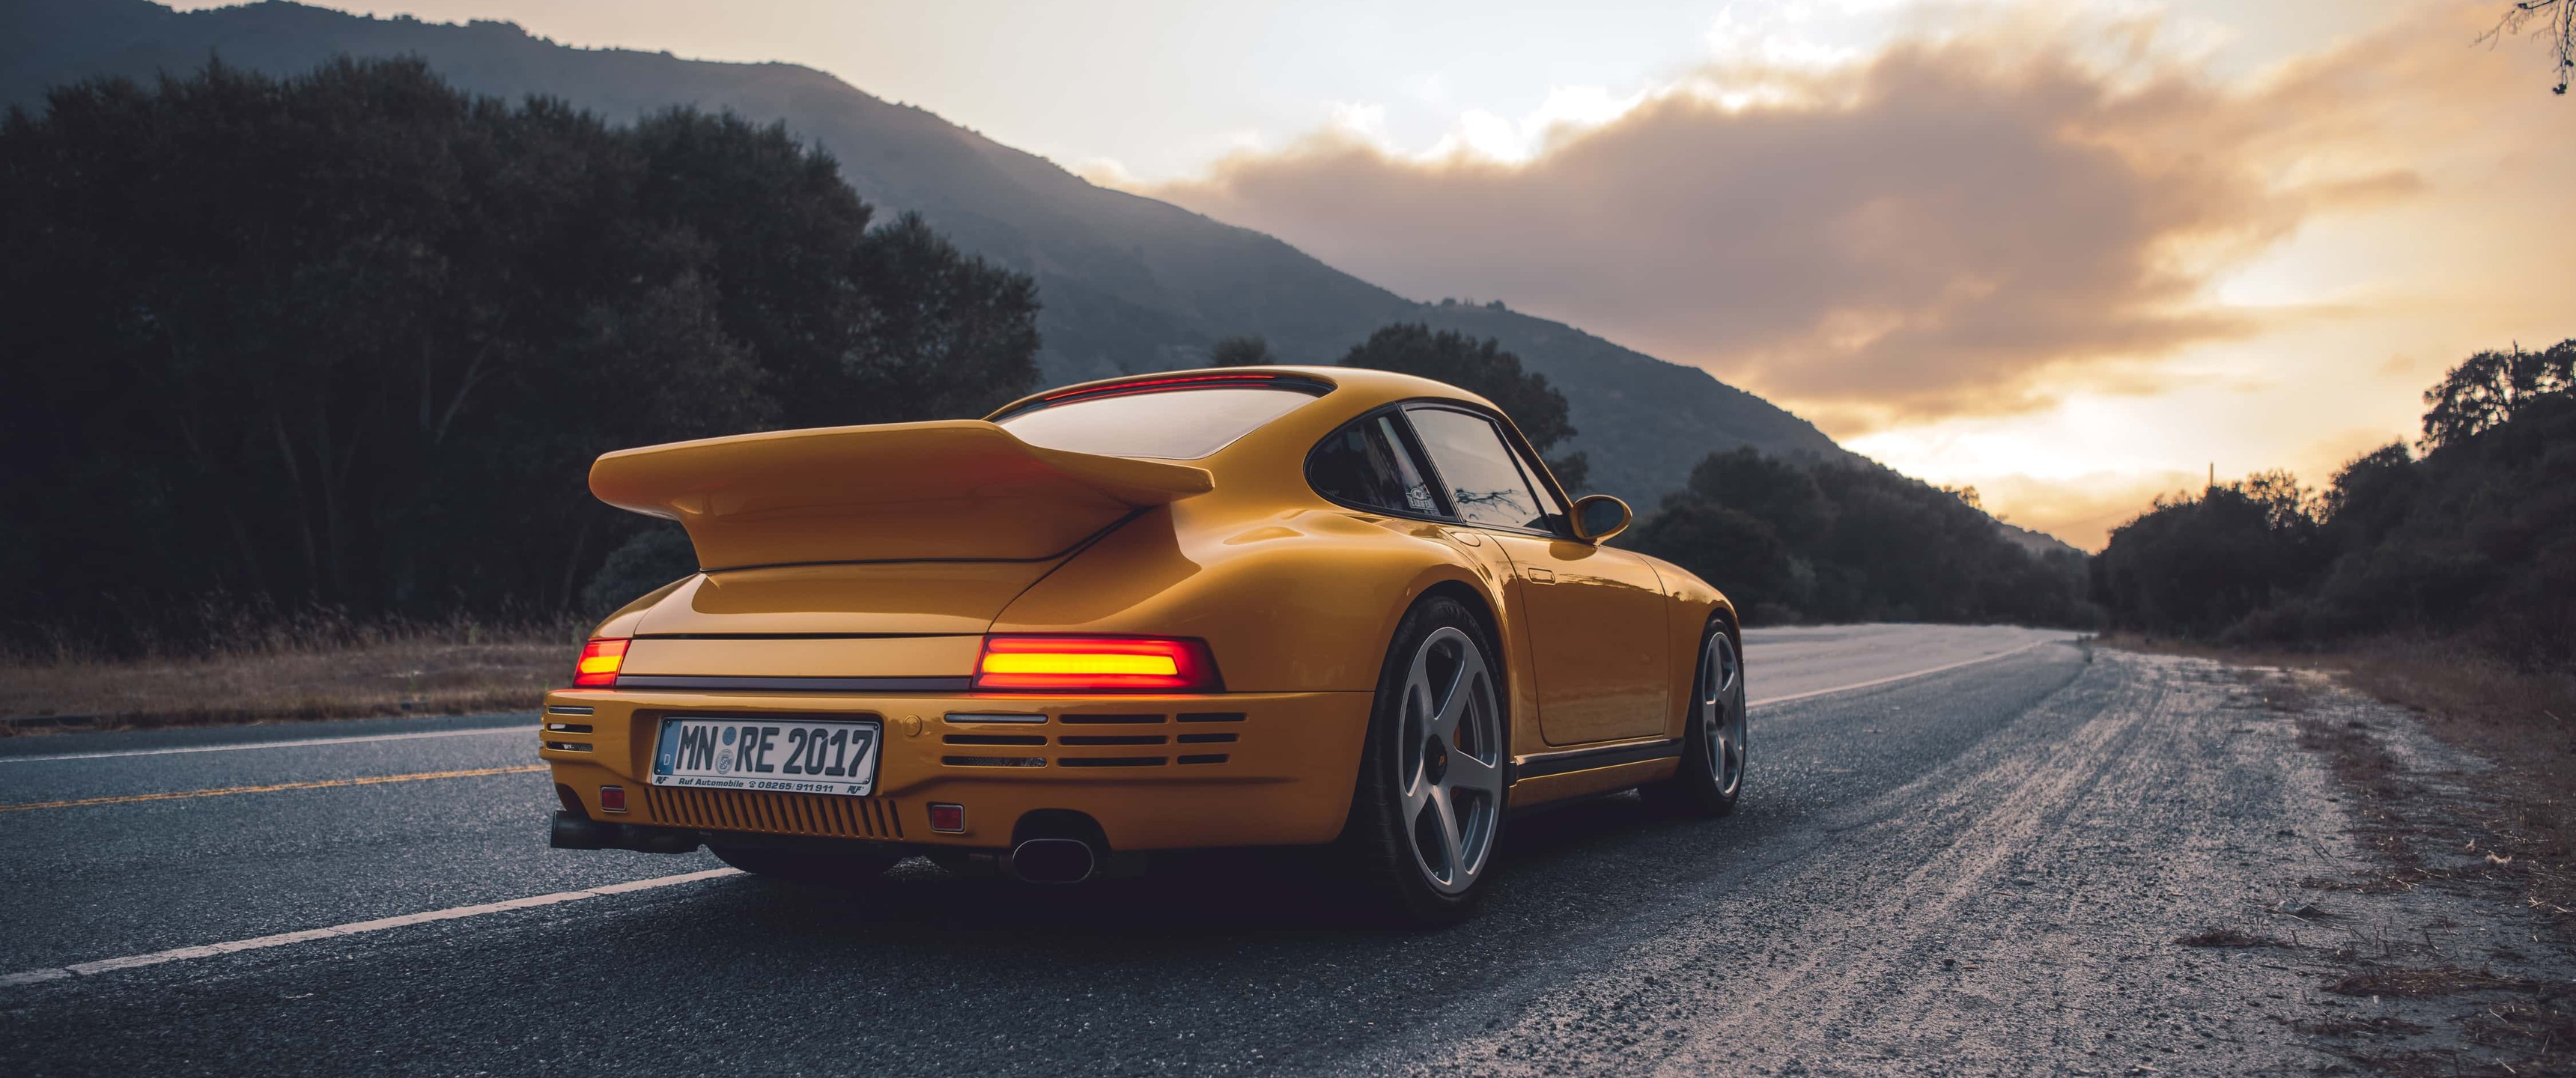 3440x1440 Porsche Rear 4k 3440x1440 Resolution HD 4k ...